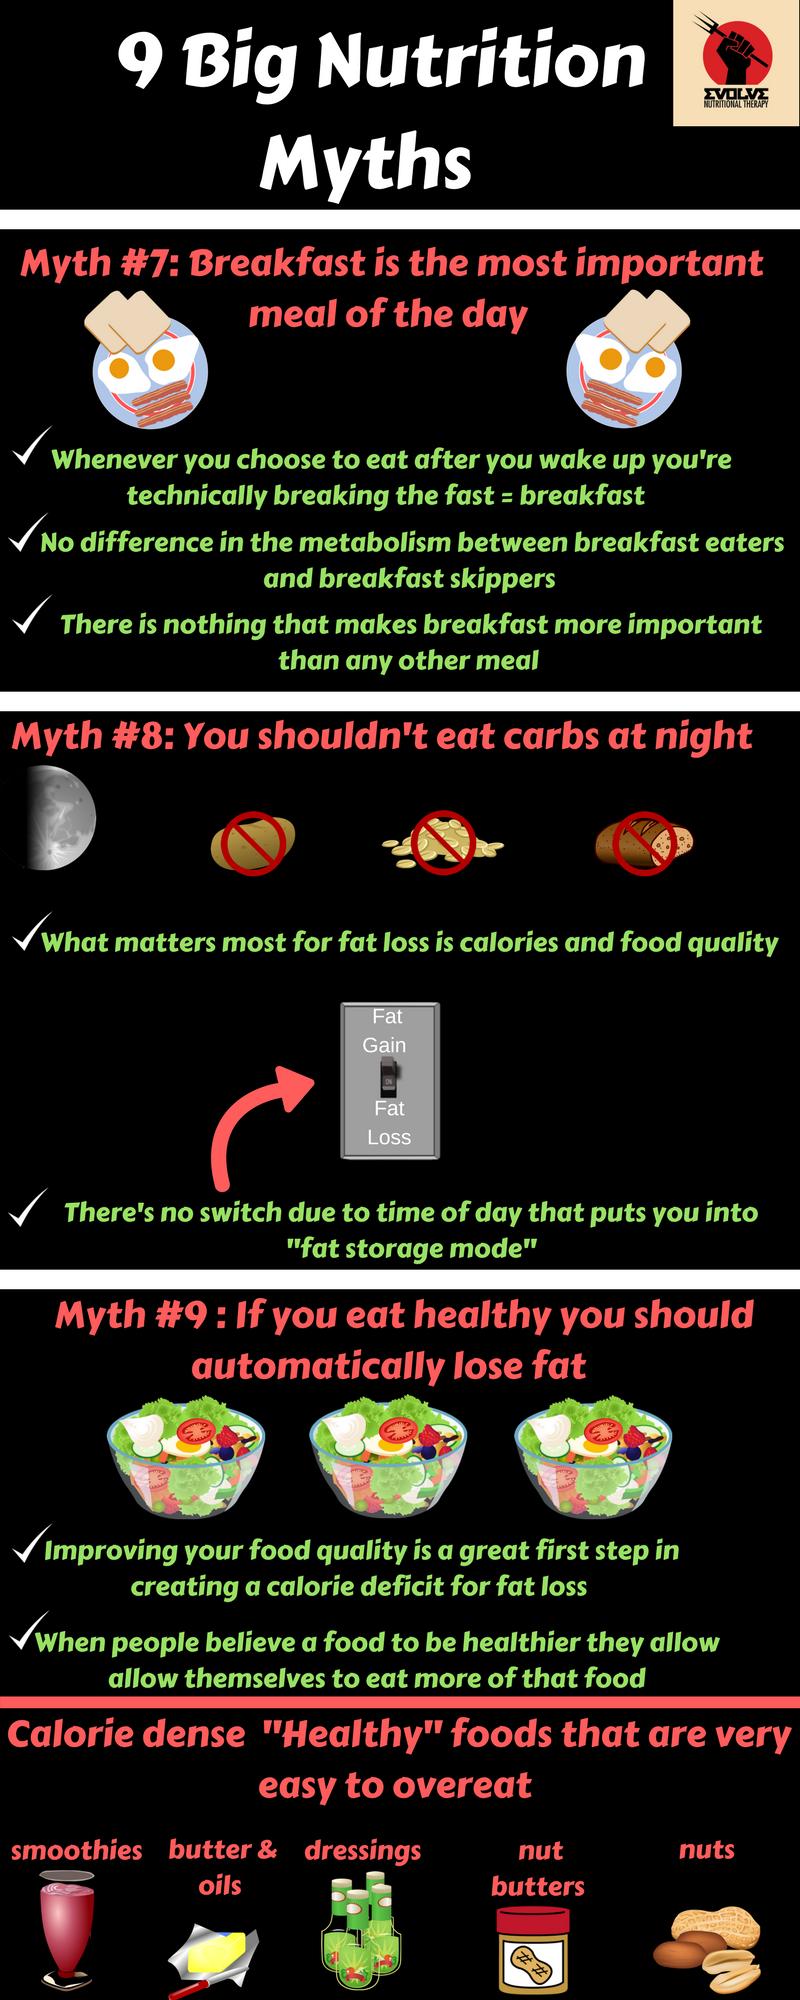 9 Big Nutrition Myths Part 3.png